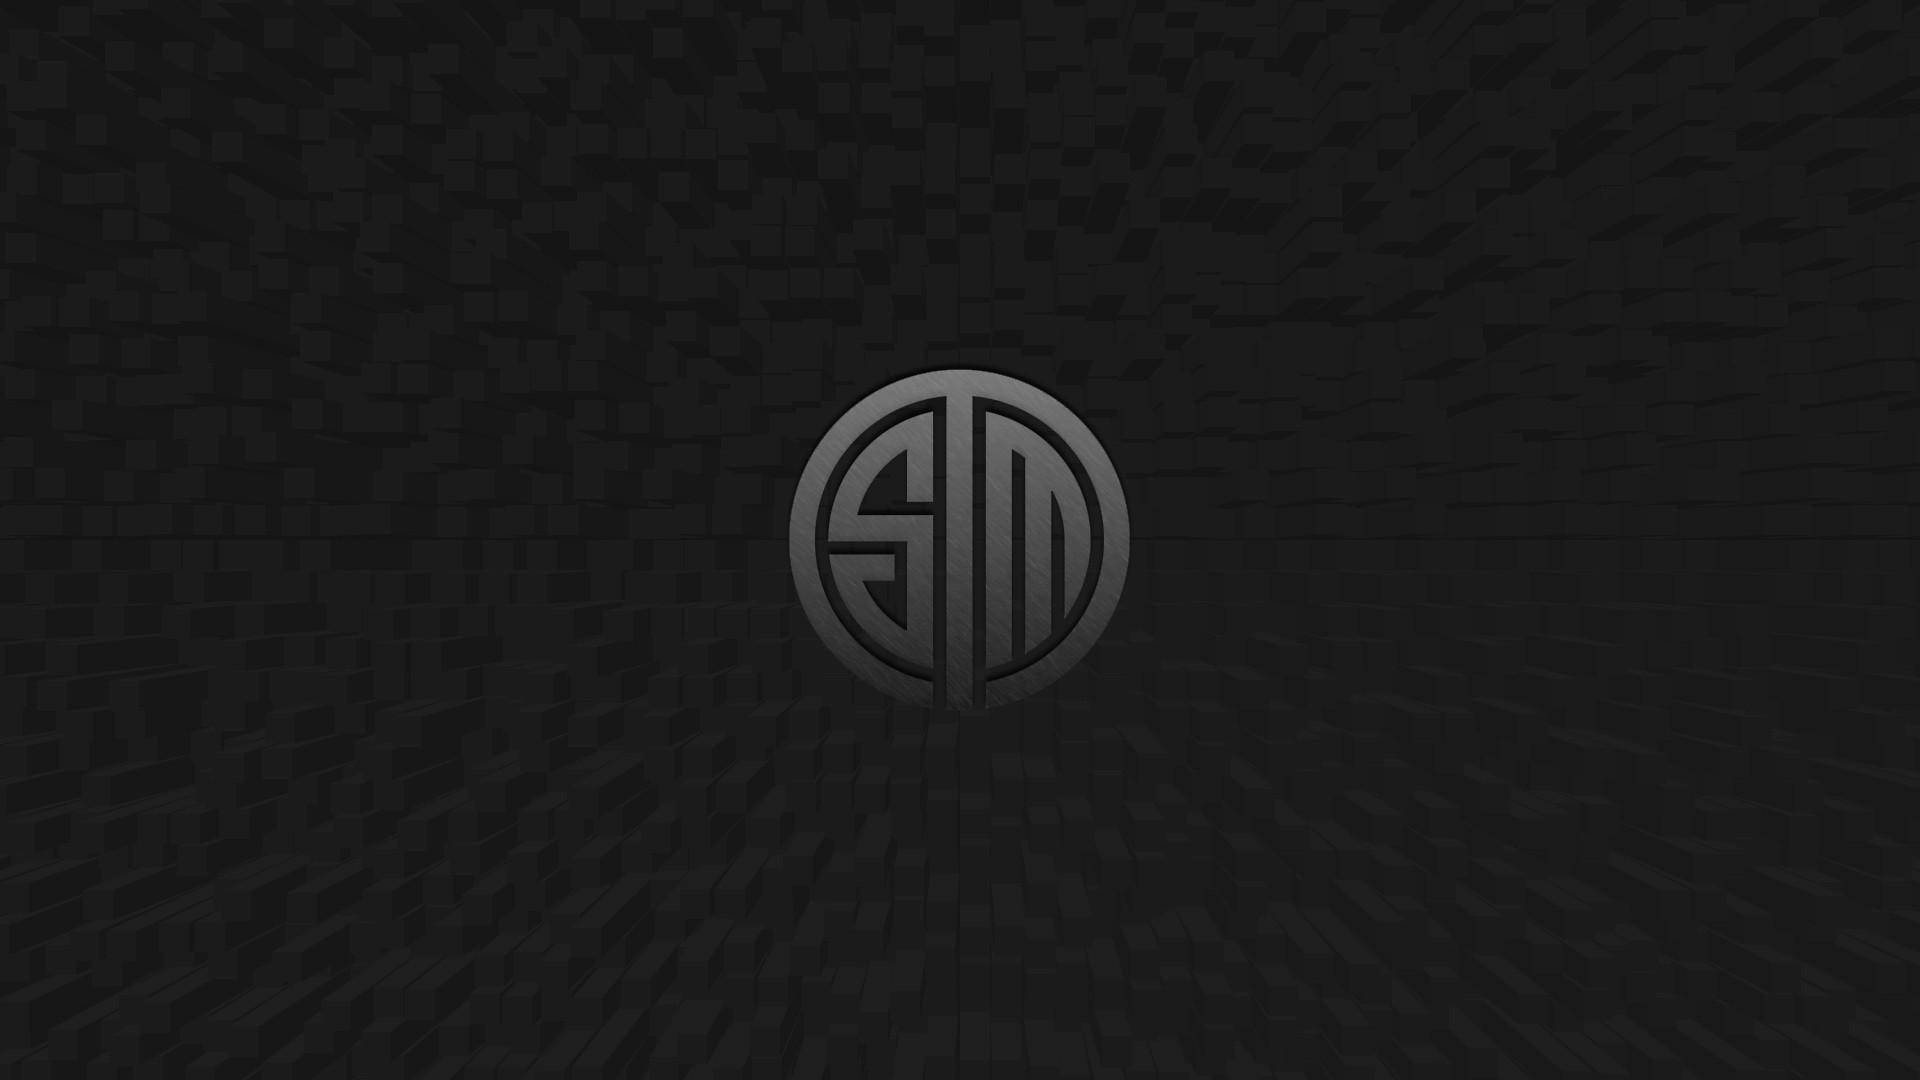 Wallpaper : League Of Legends, Text, Logo, Circle, E